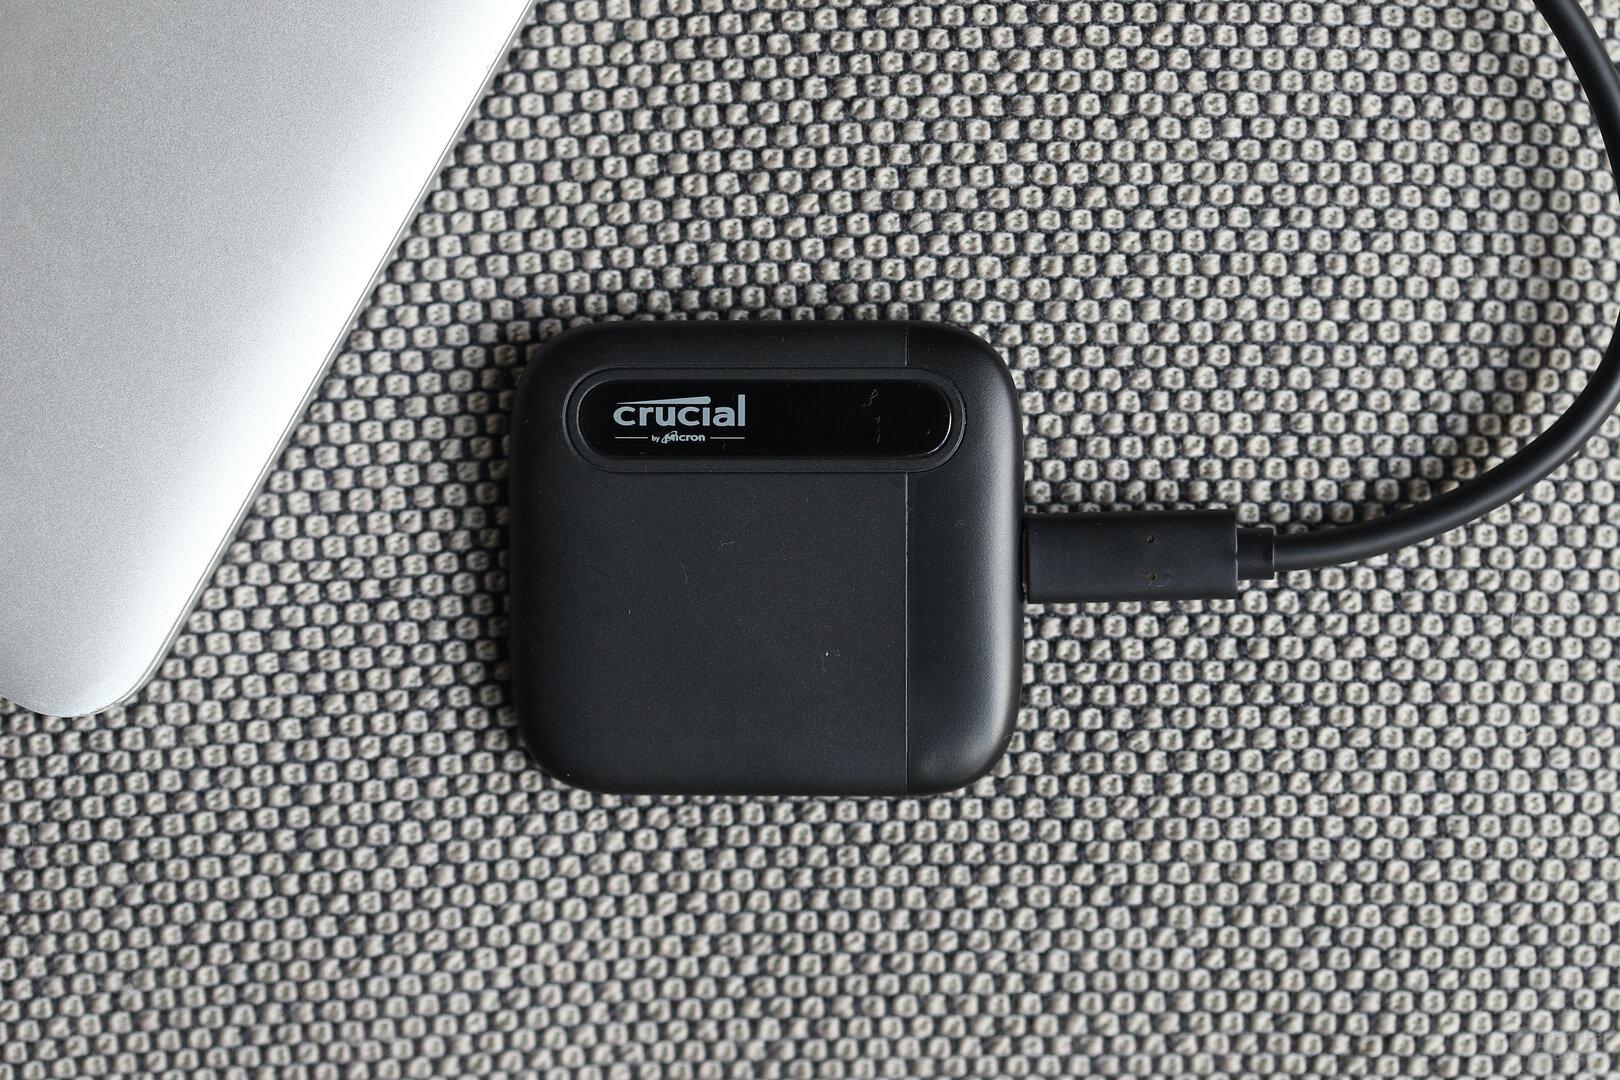 Die Crucial X6 Portable SSD 4 TB im kompakten Kunststoff-Gehäuse